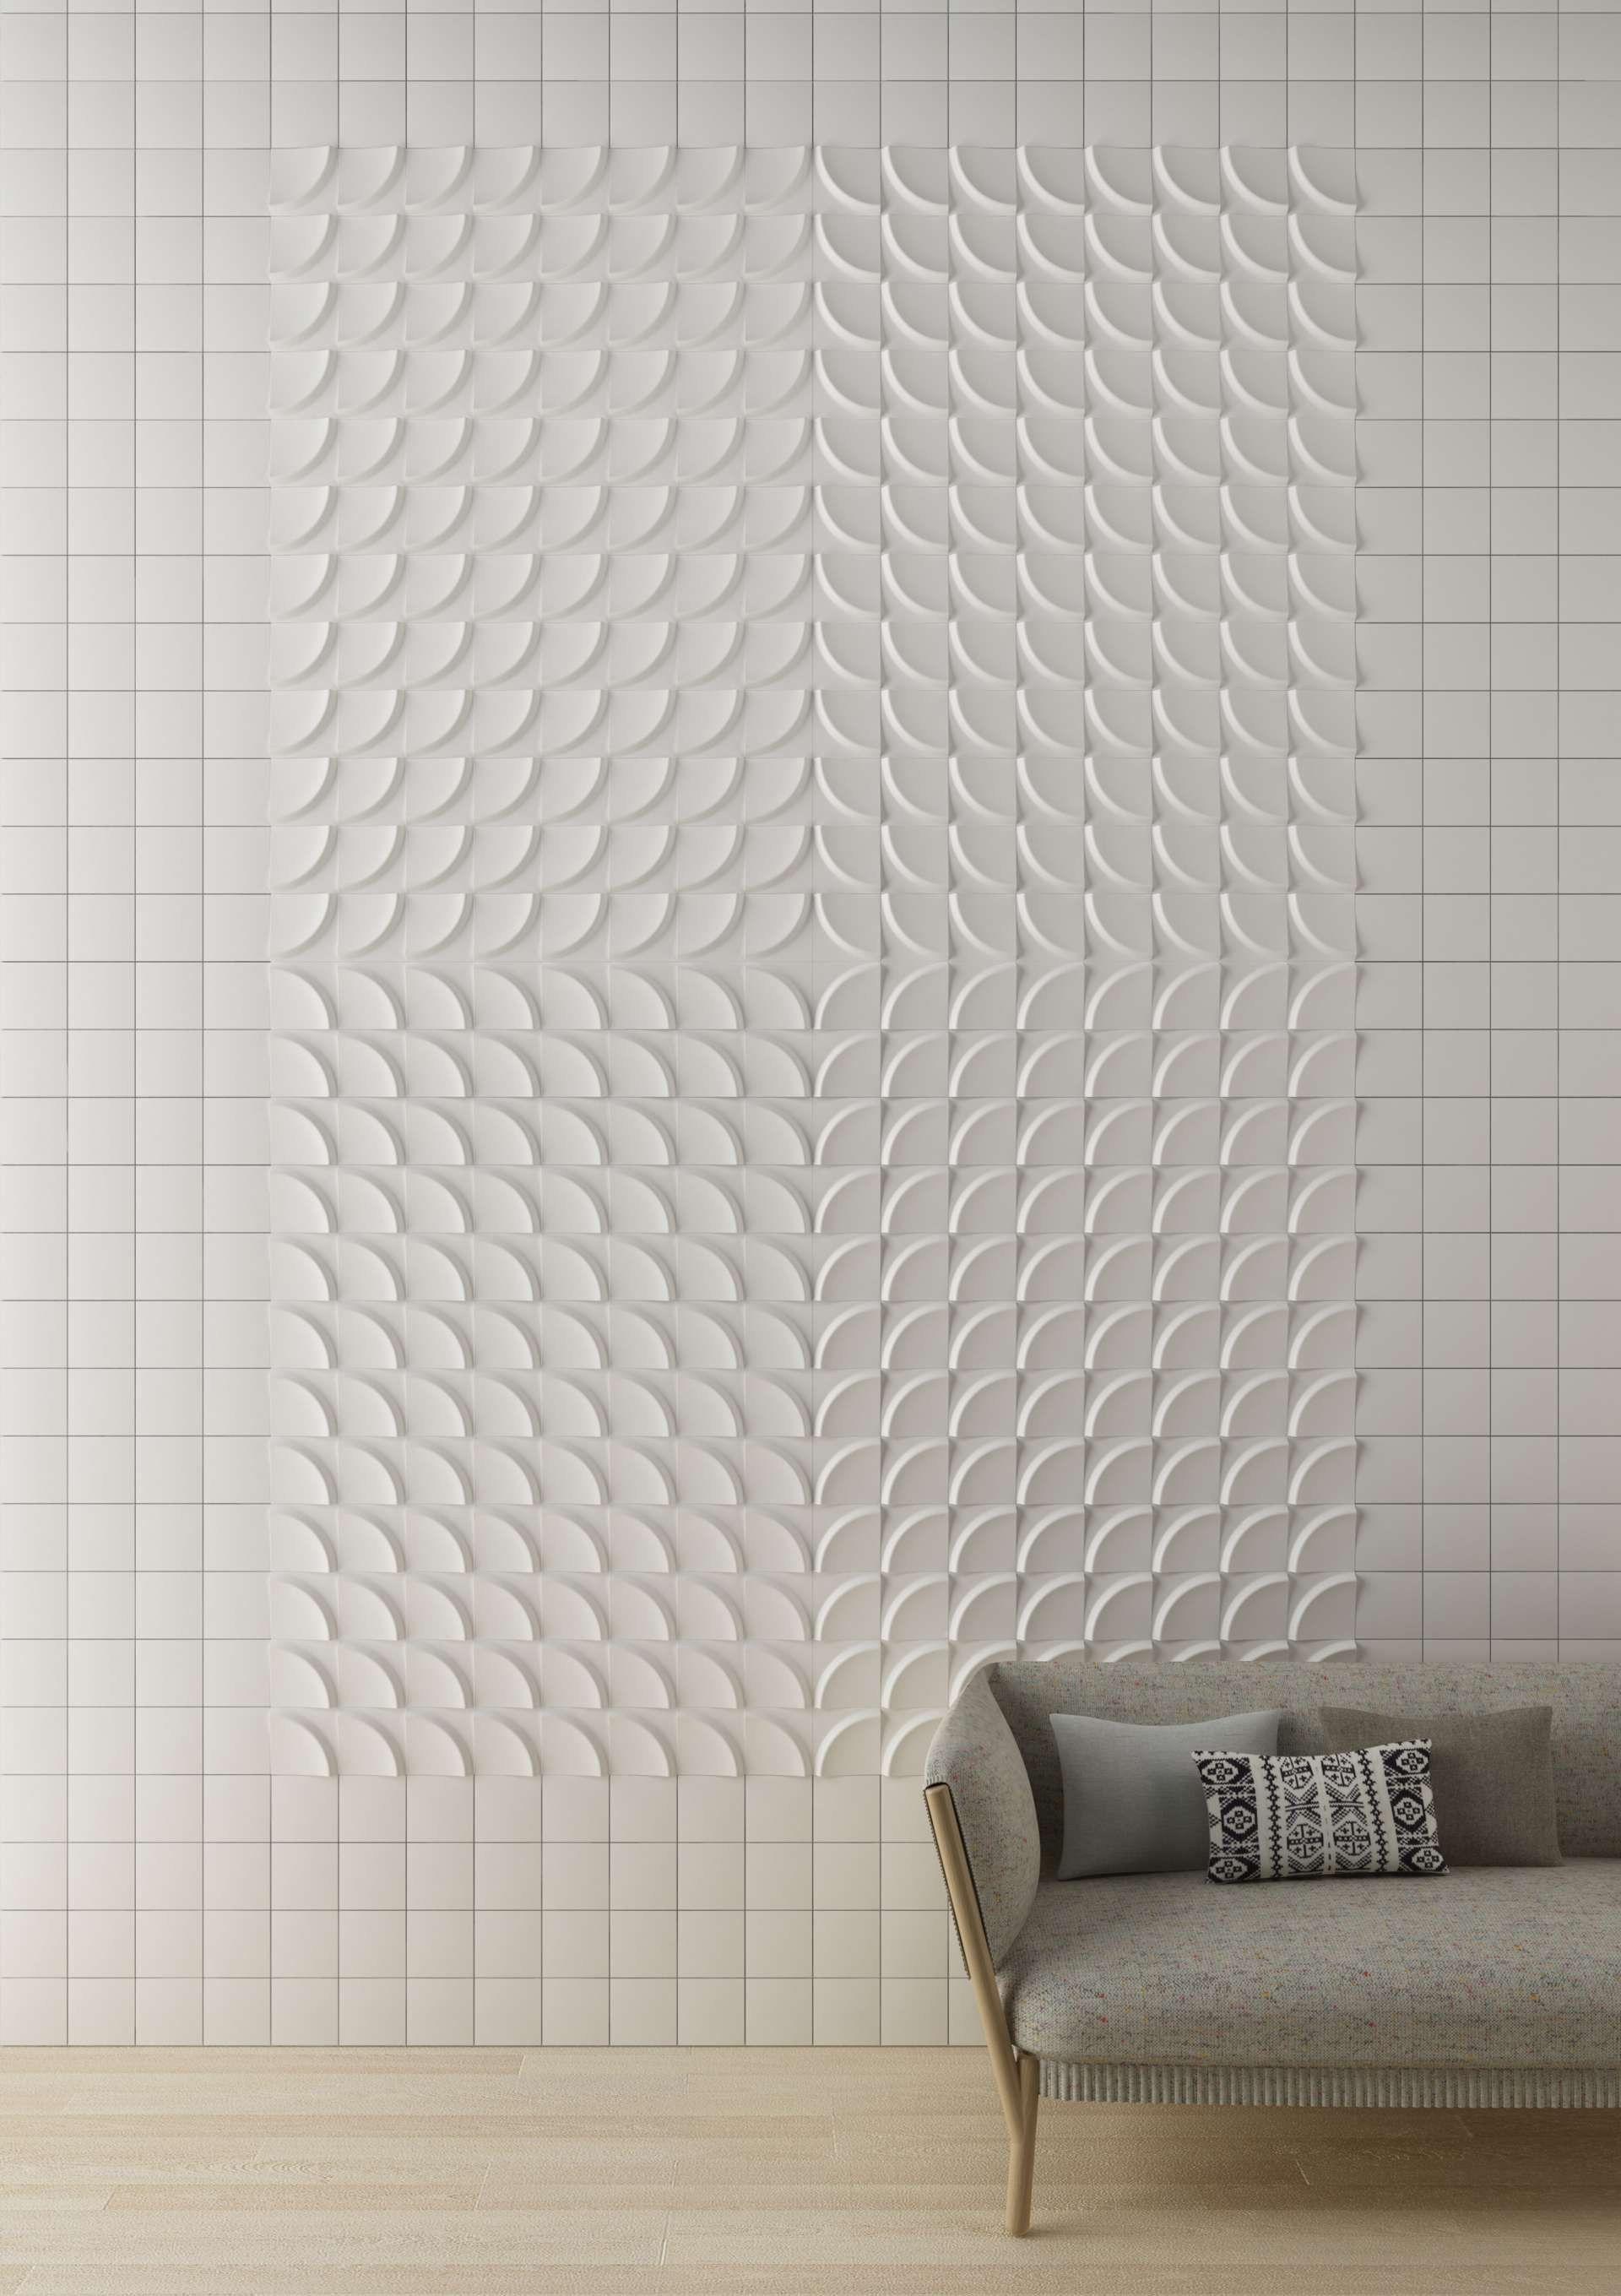 Ceramic Wall Tiles Bowl Harmony Peronda Group With Images Wall Tiles Design Wall Tiles 3d Wall Tiles